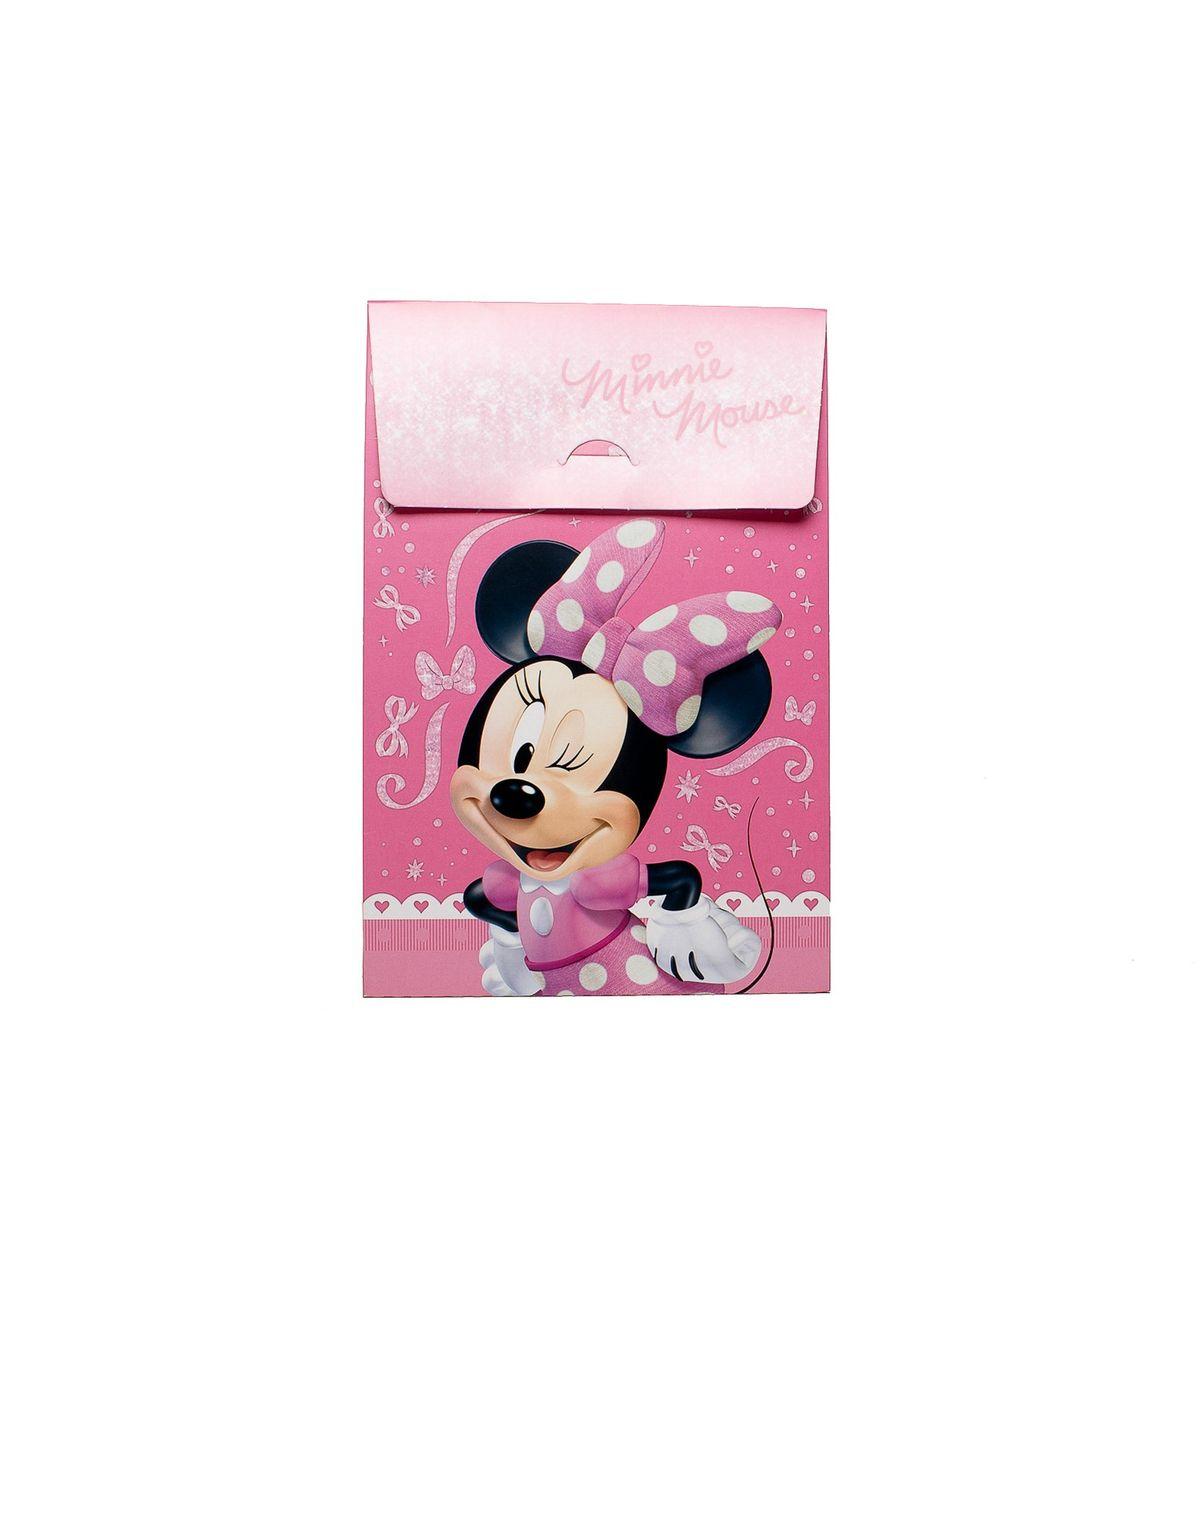 2050004890174-Embalagem-Presente-Estampa-Minnie-UNICA-U-1-2-3